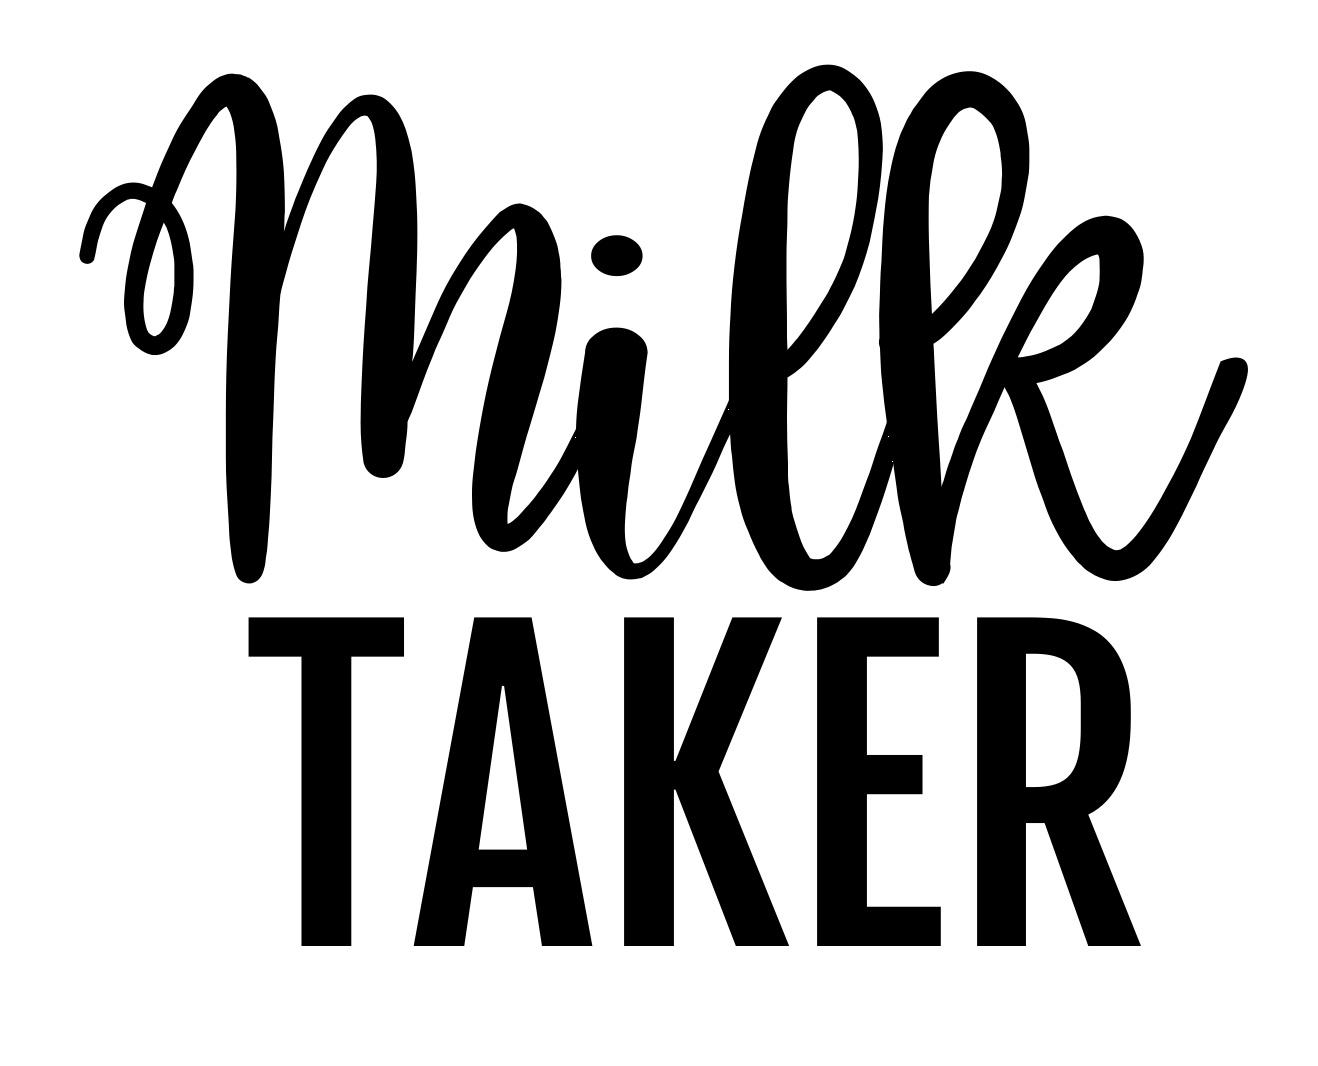 milk taker